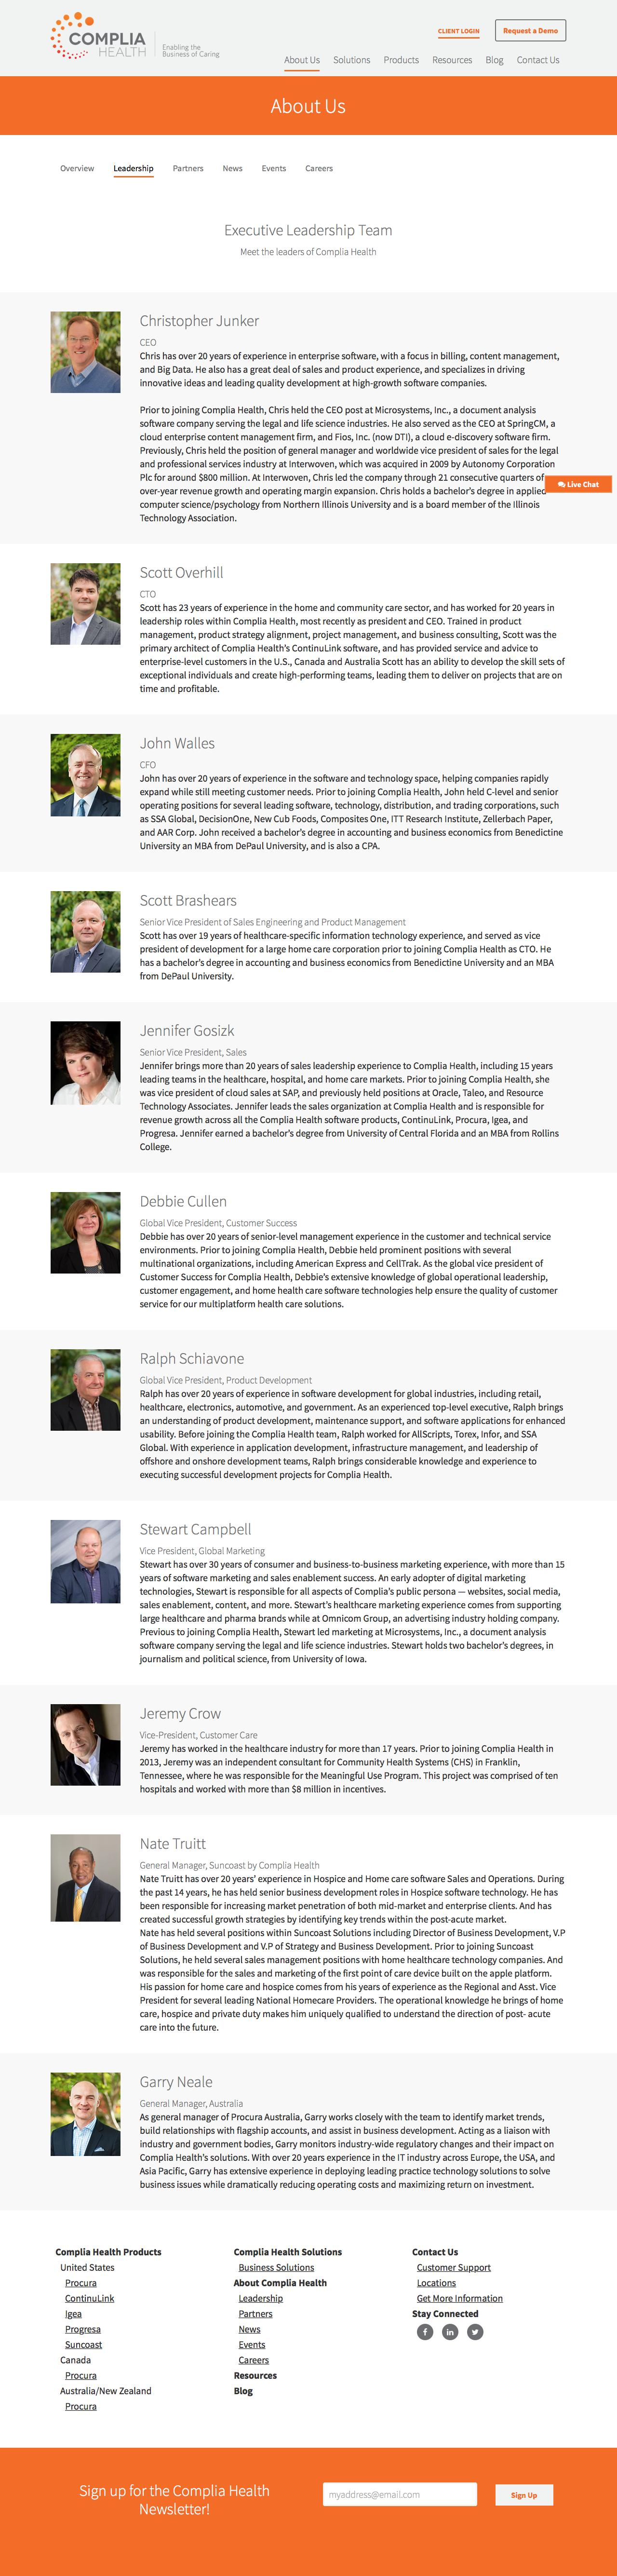 Screenshot of compliahealth.com - Leadership at Complia - captured Oct. 22, 2016